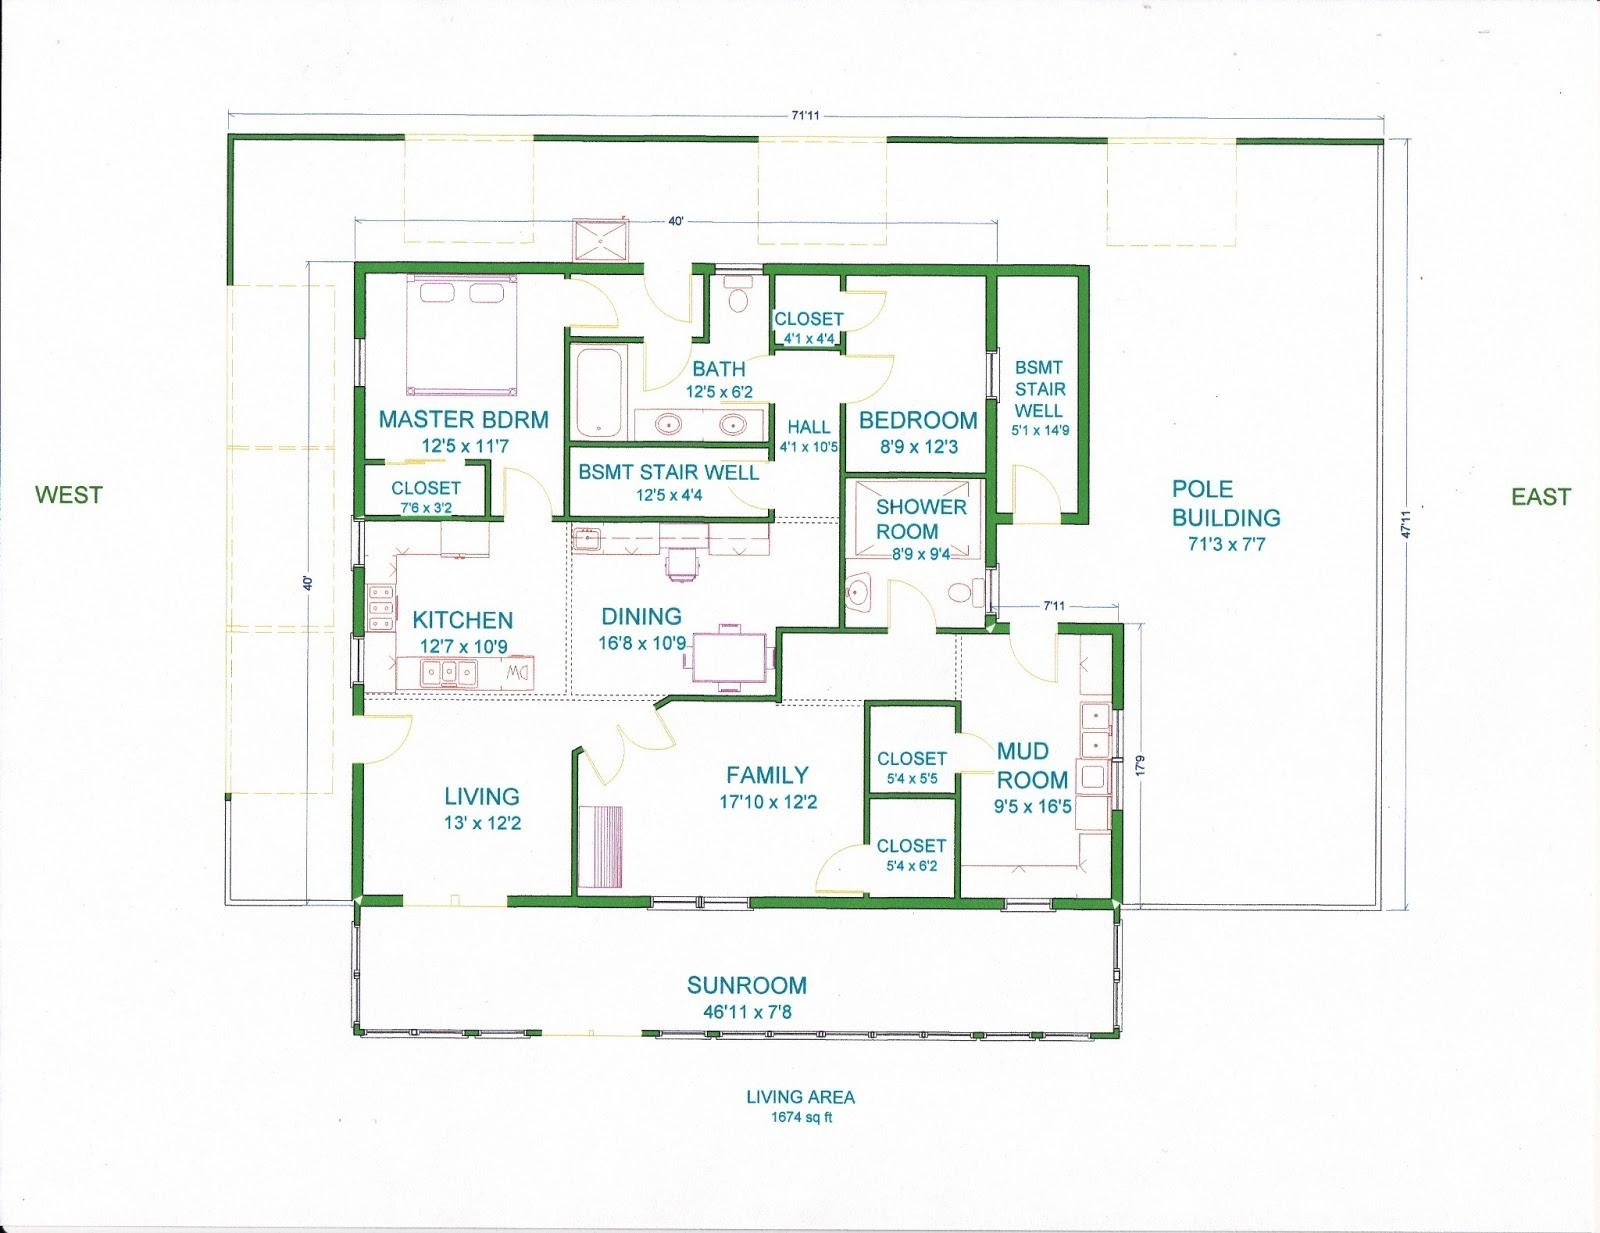 Pole Barn Home Floor Plans With Basement